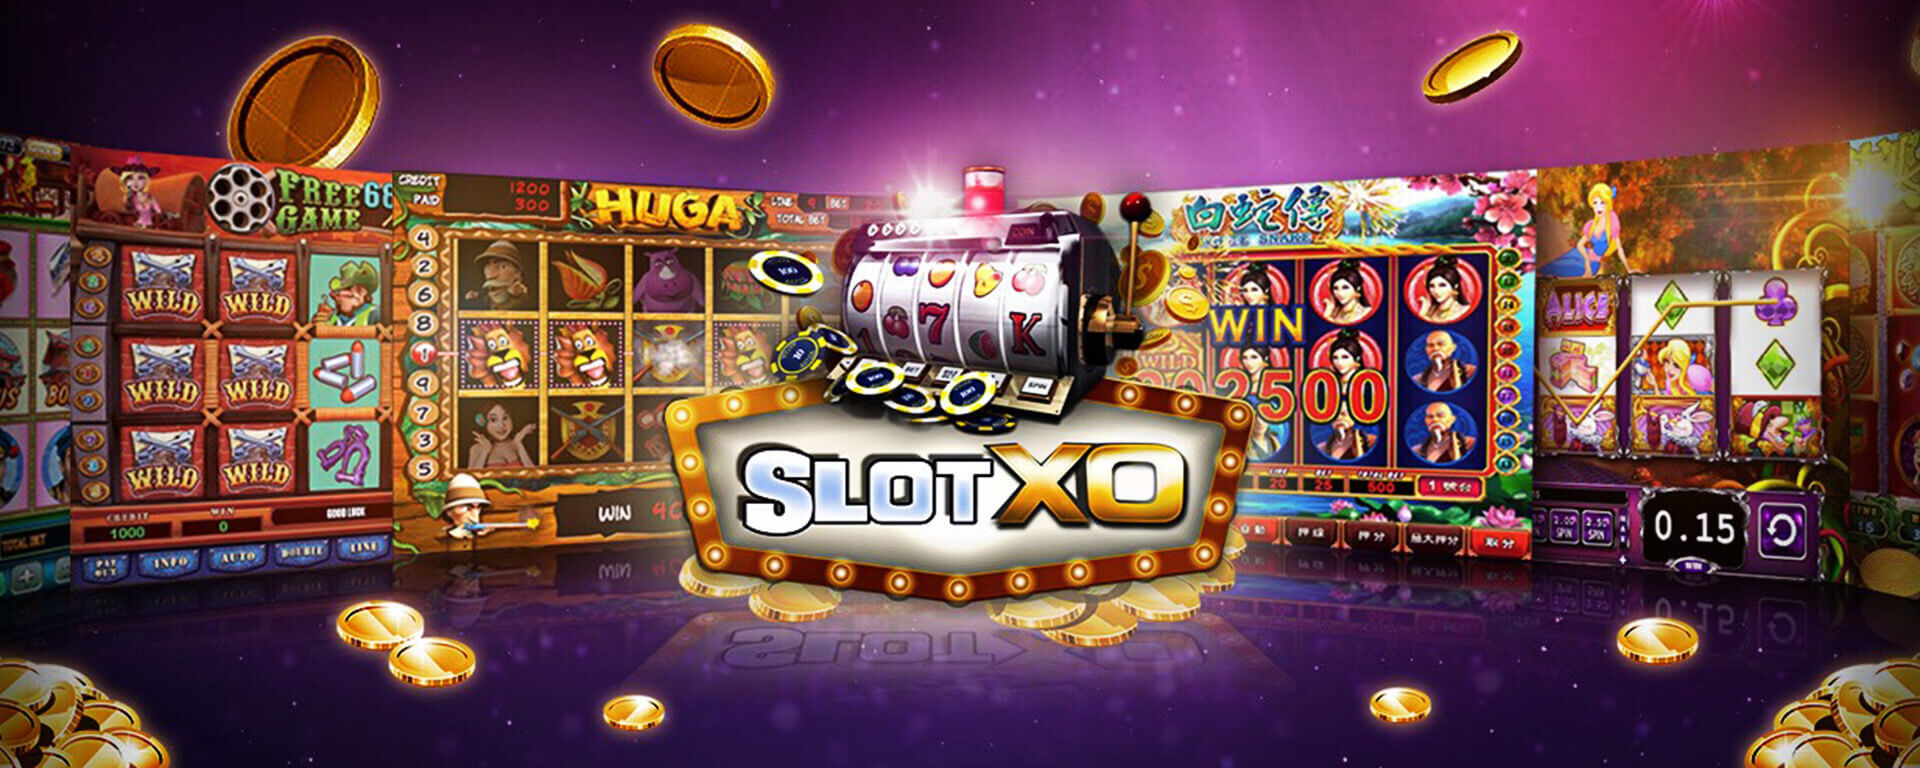 slotxo-เข้าสู่ระบบ5-slot-xo